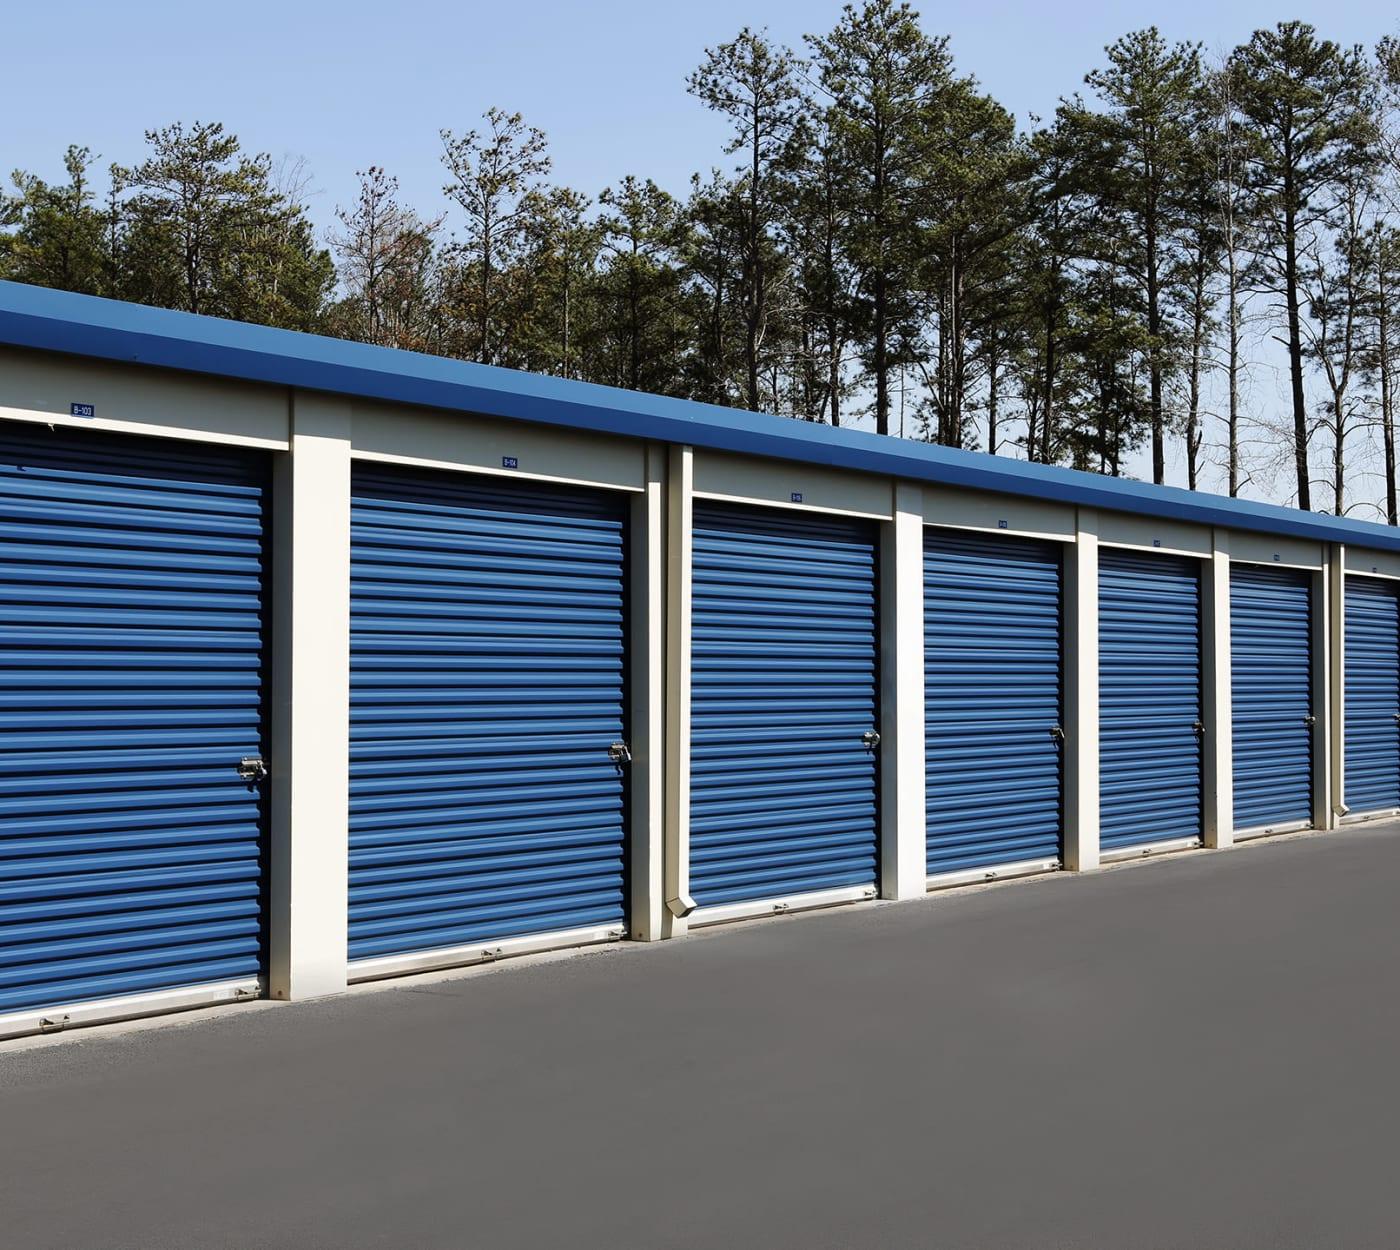 Ground-floor unit at Midgard Self Storage in Midland, North Carolina